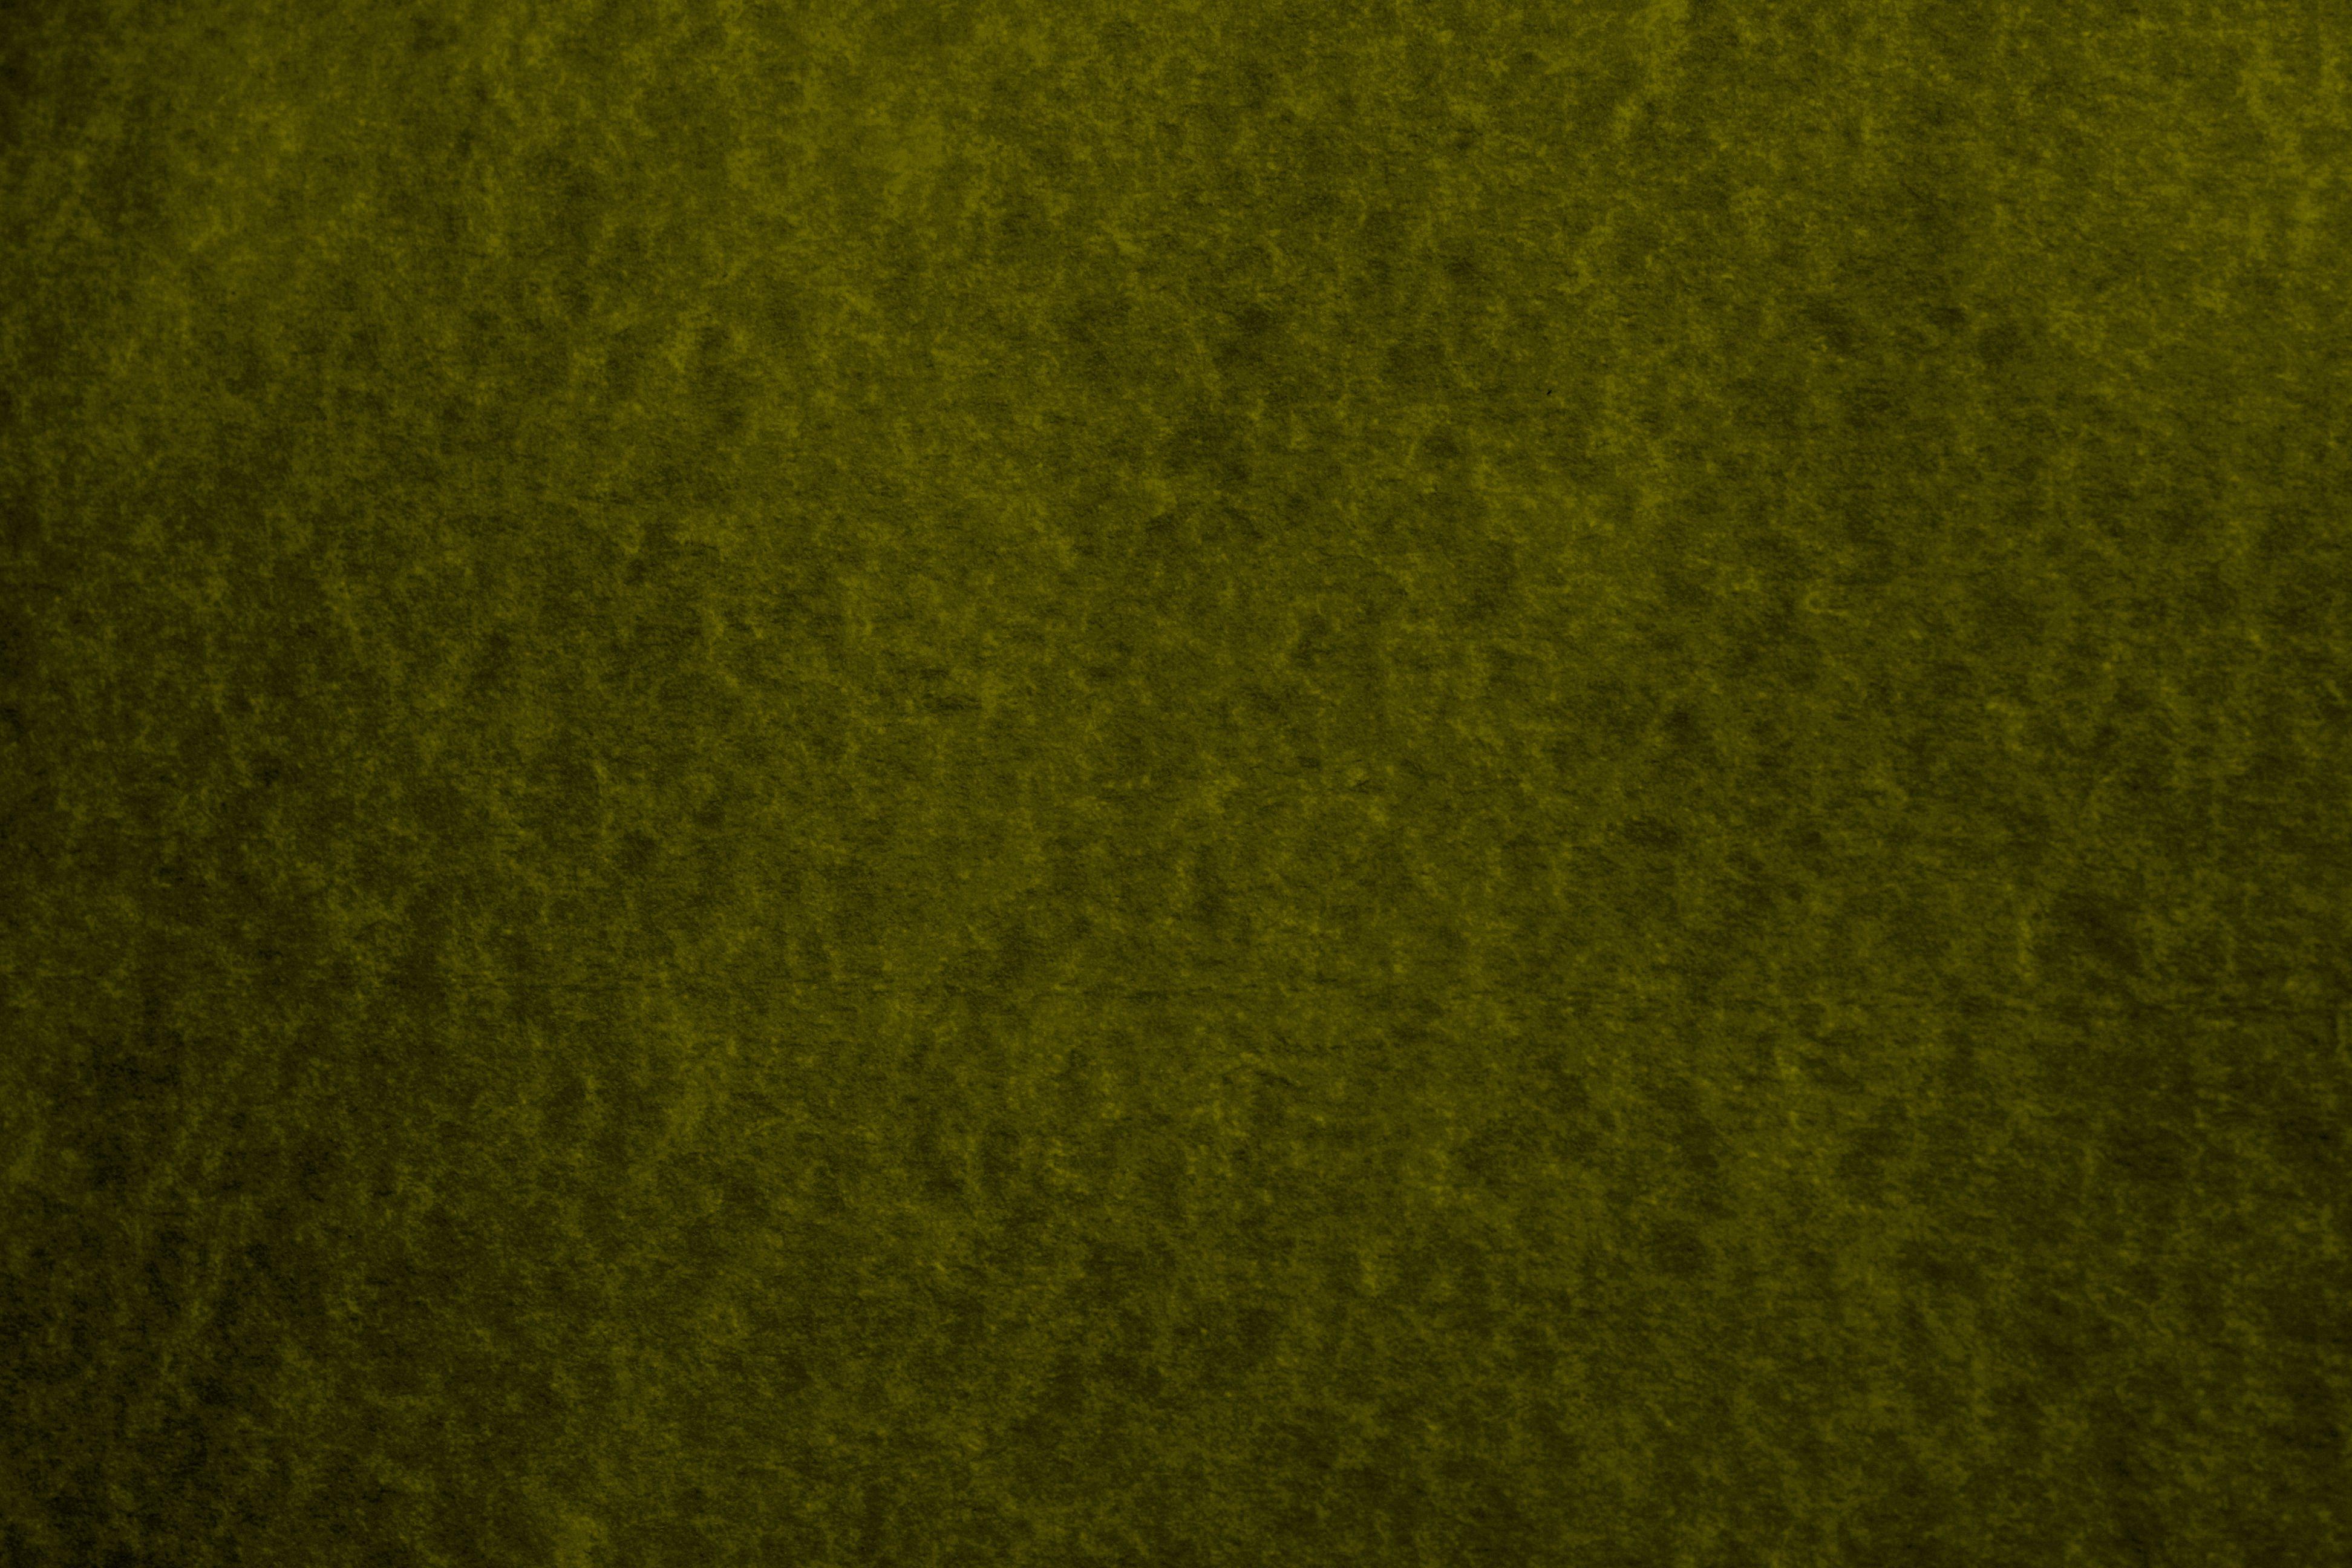 Olive Green Parchment Paper Texture Picture 3888x2592